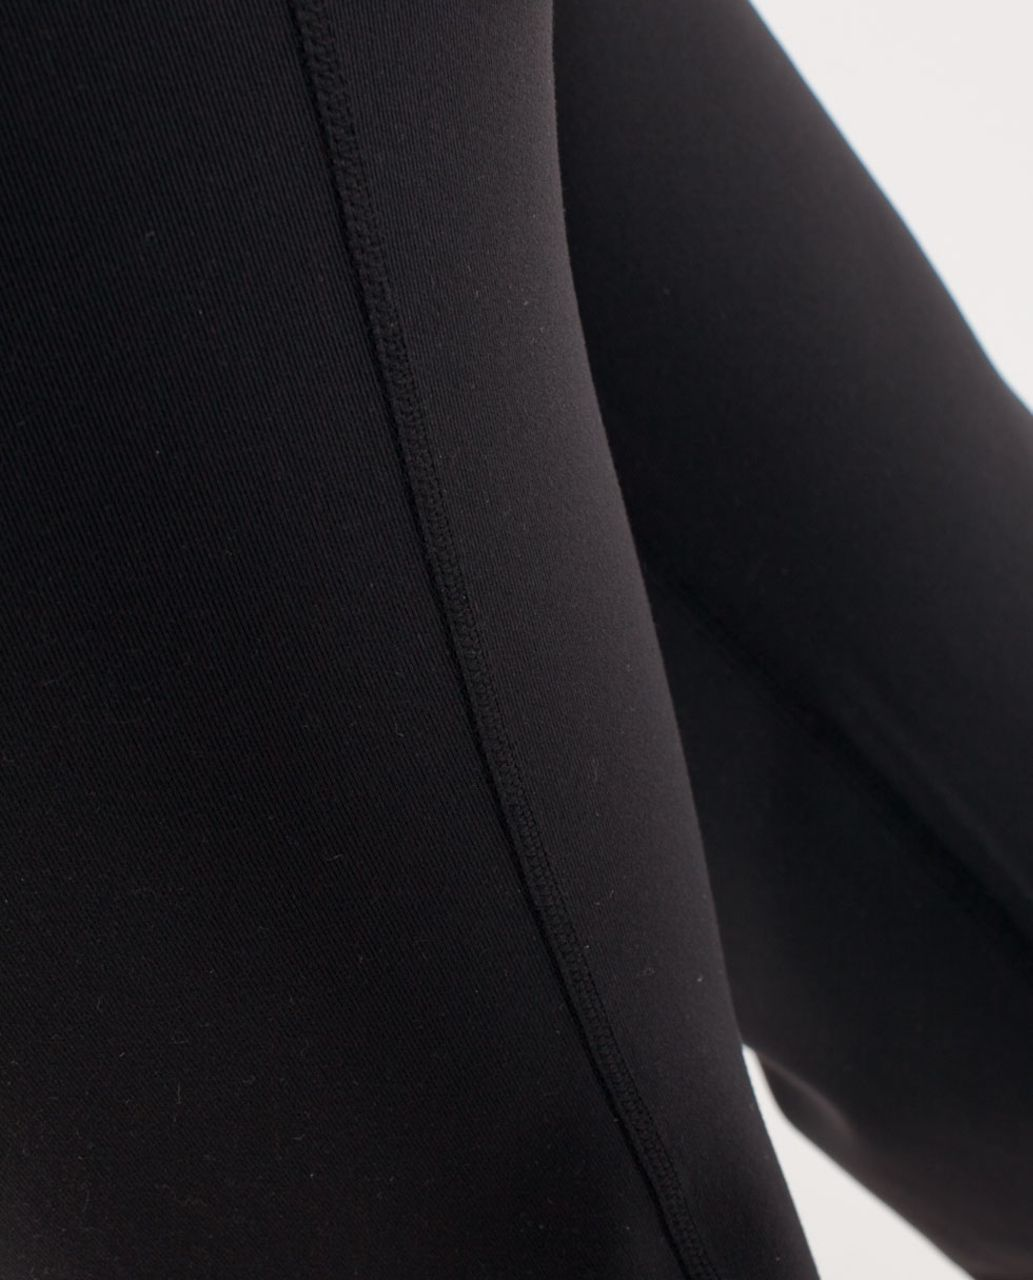 Lululemon Groove Pant (Tall) - Black /  Static Dark Classic Sport Grey /  Senorita Pink